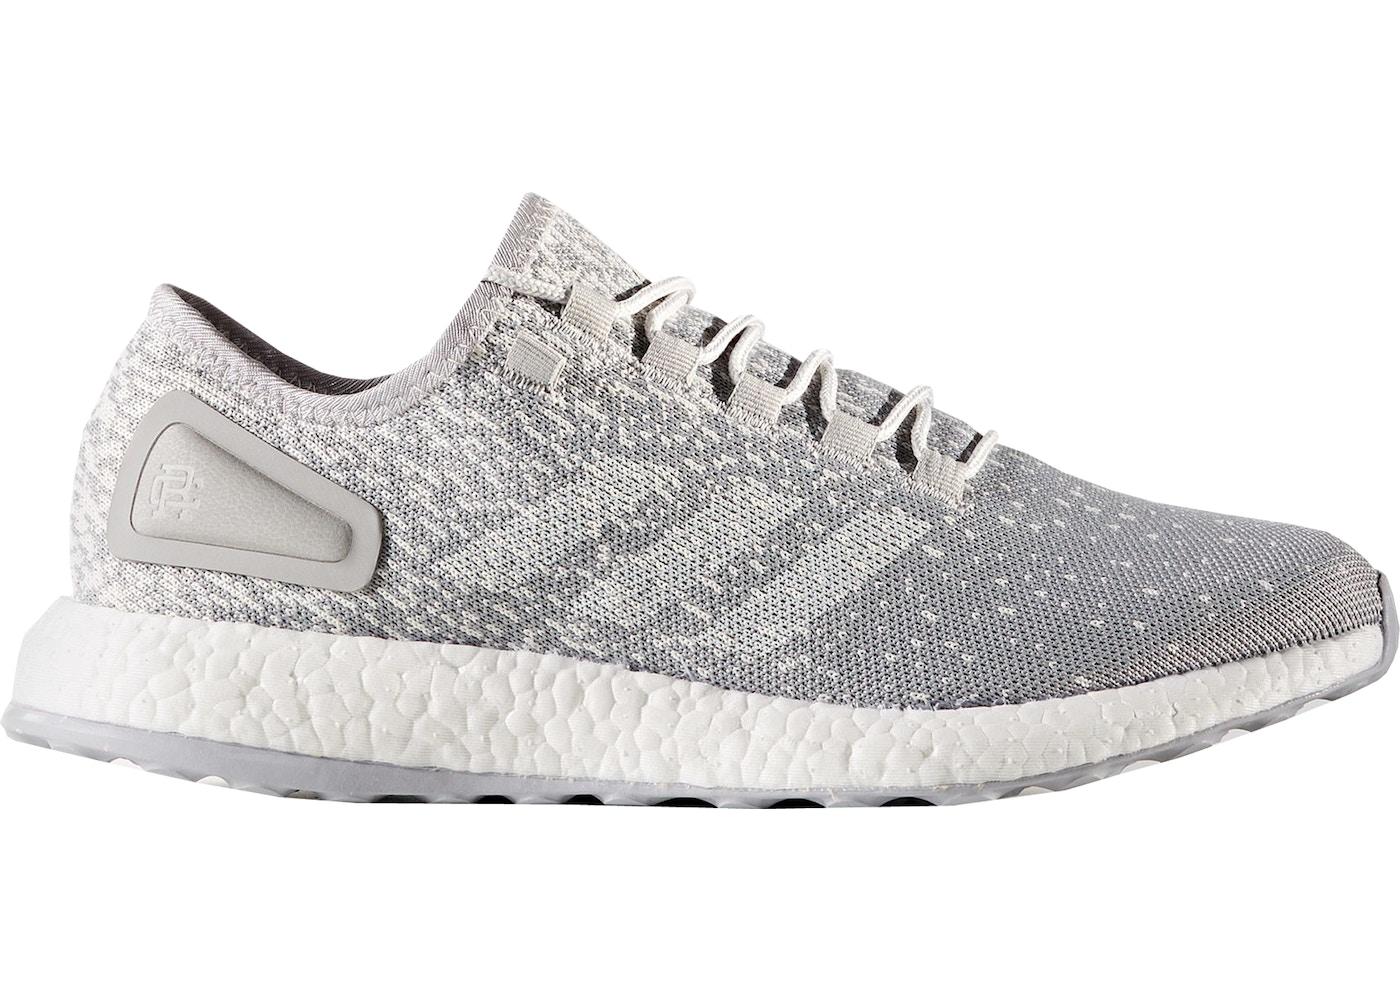 new arrival e3142 25a2e adidas Size 12 Shoes - Volatility